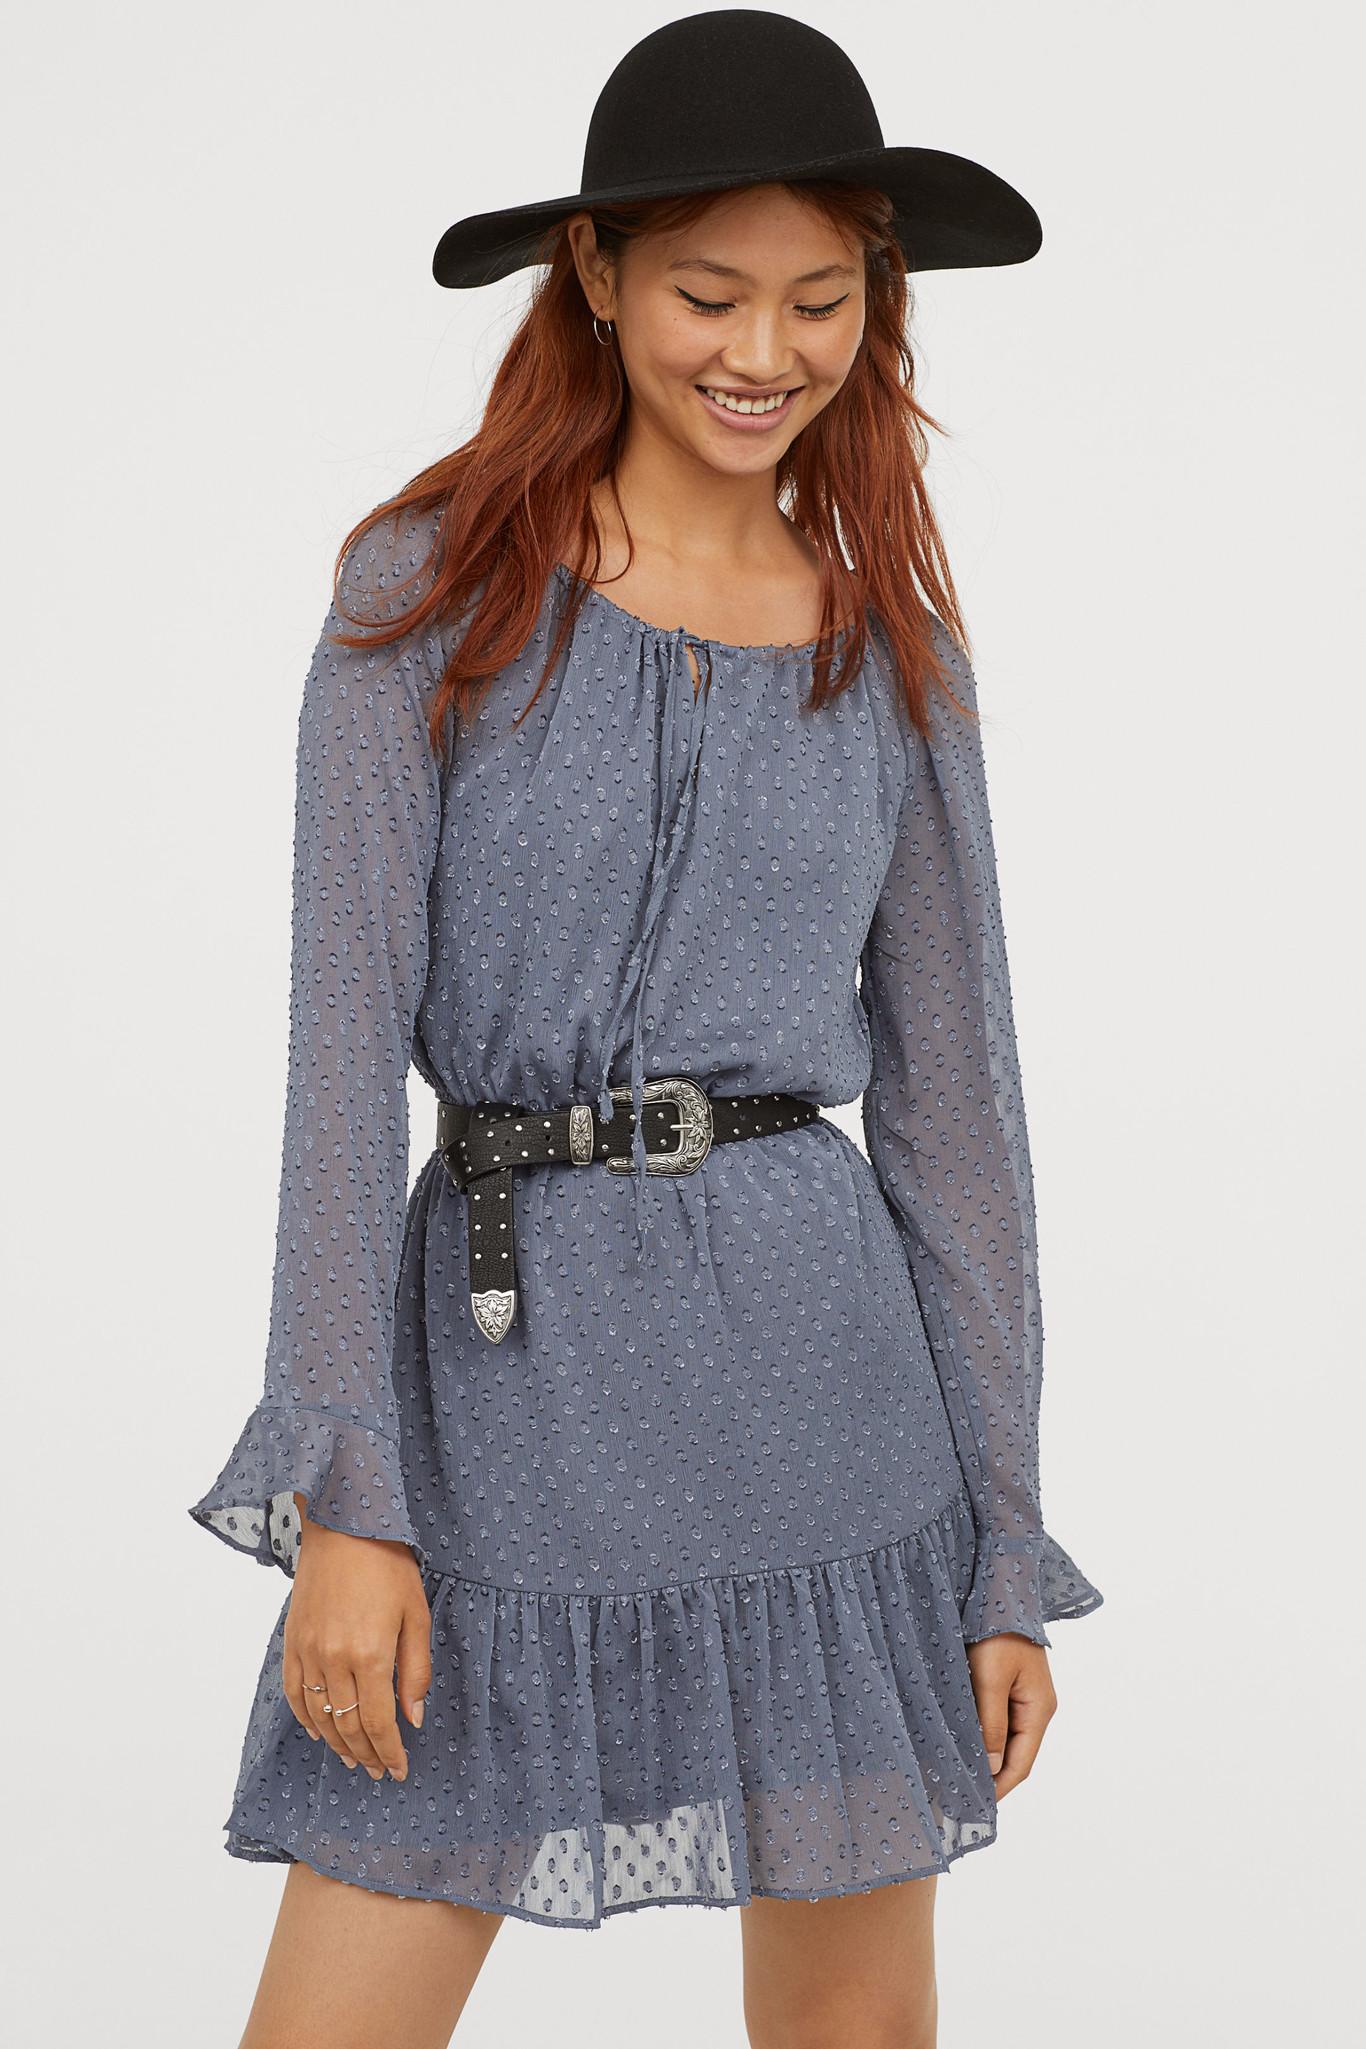 4fa40440f 17 vestidos de H&M por menos de 35 euros para lucir ideal todo el día